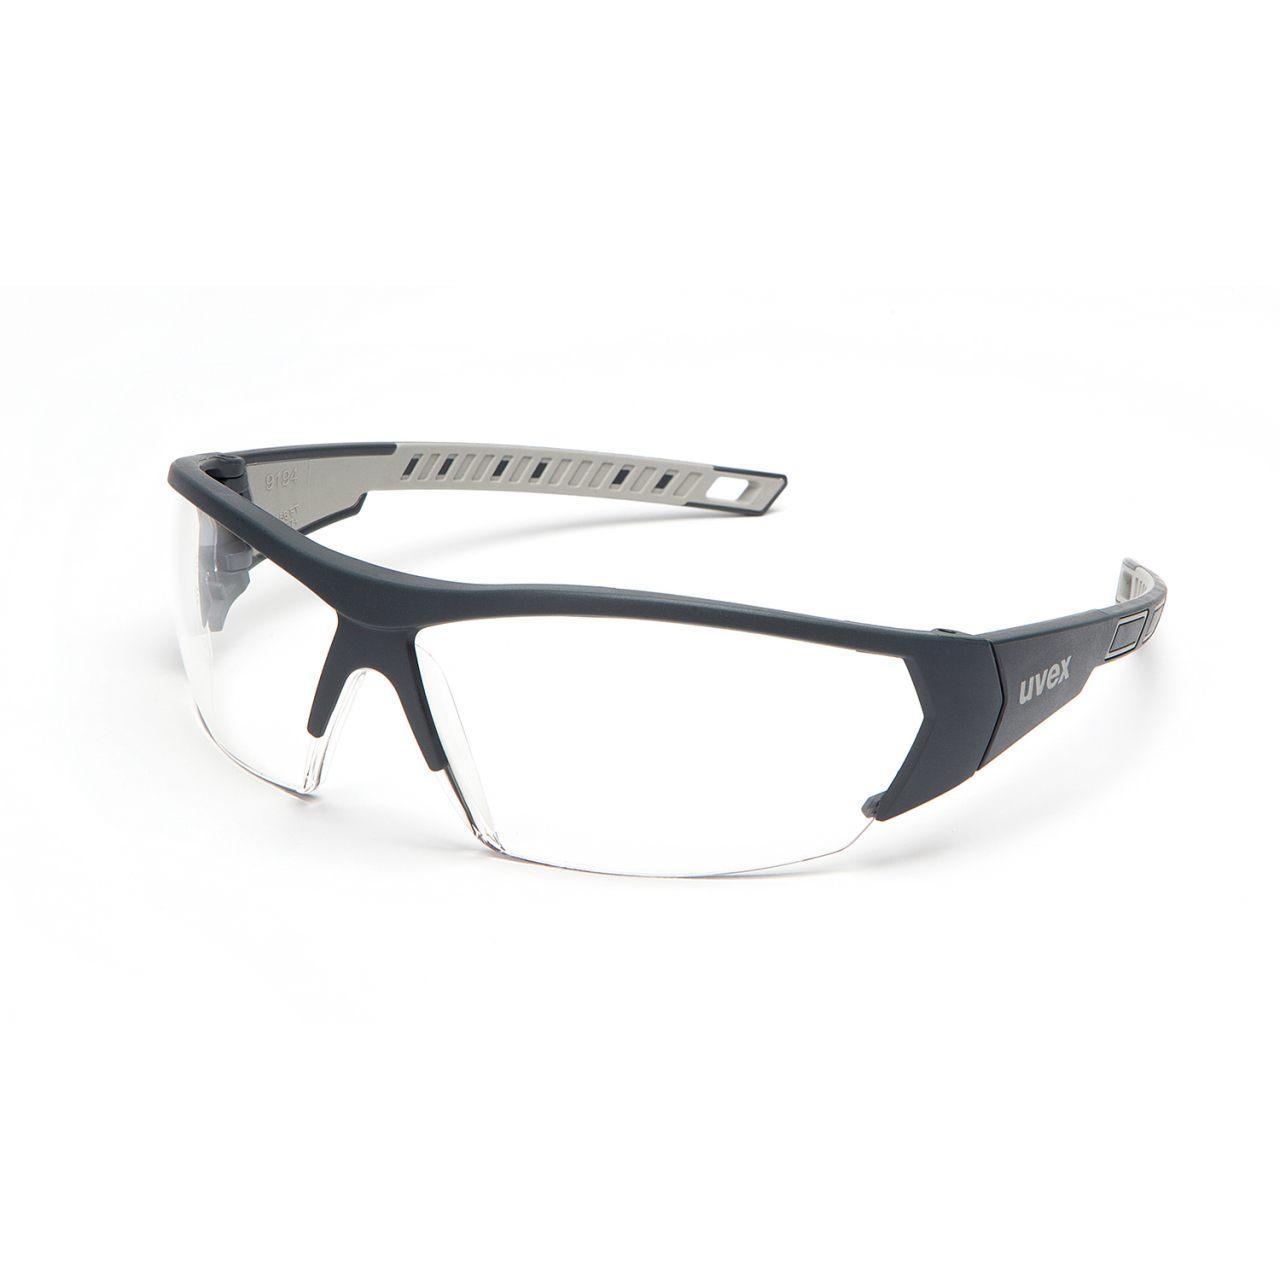 Uvex iWorks THS Anti-Fog Safety Glasses - Clear